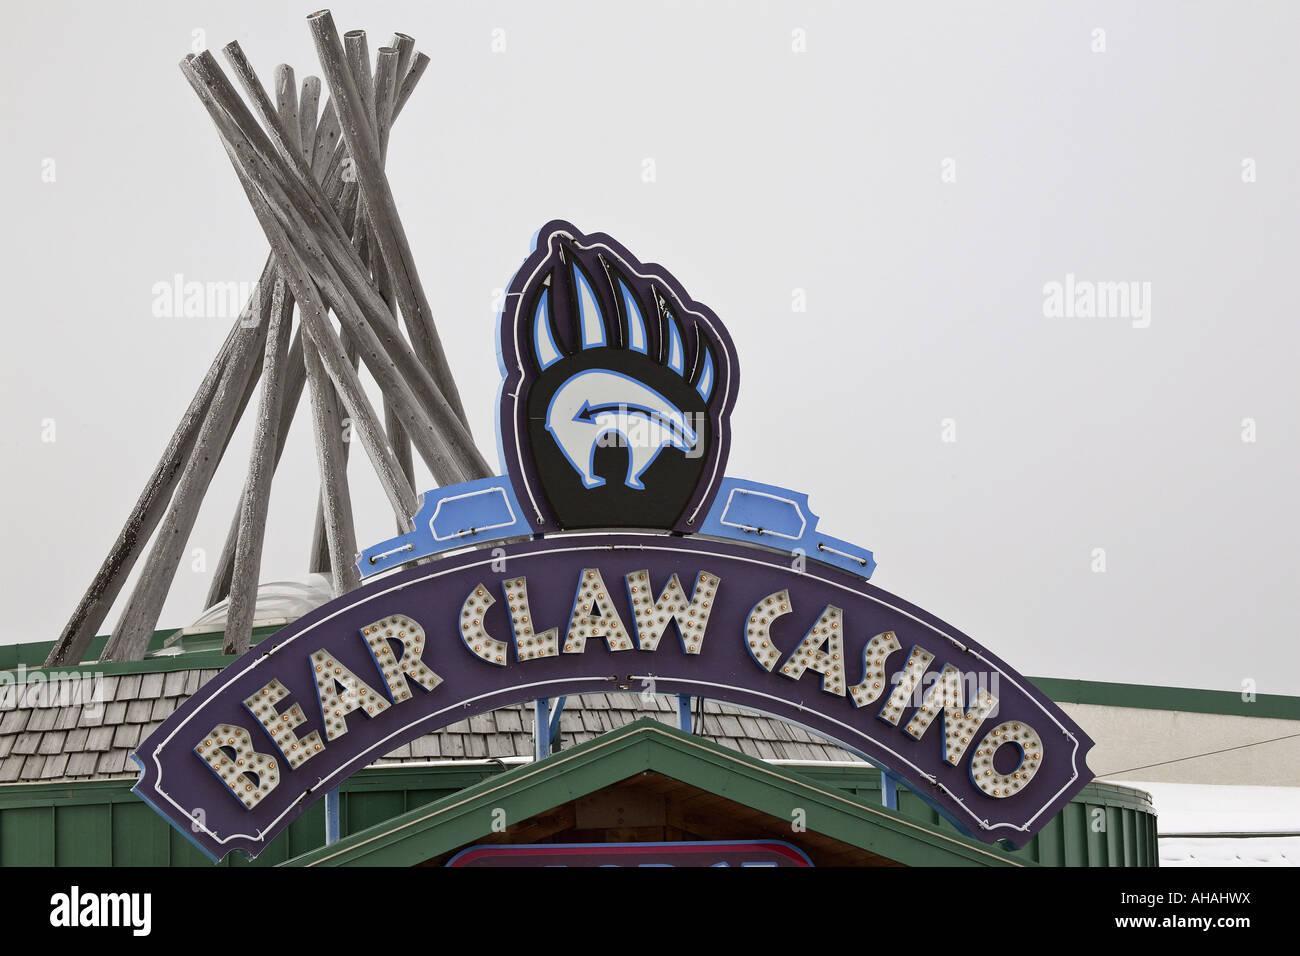 Painet jl7216 casino sign white bear indian reserve saskatchewan canada 5 claw first nations travel horizontal digital - Stock Image